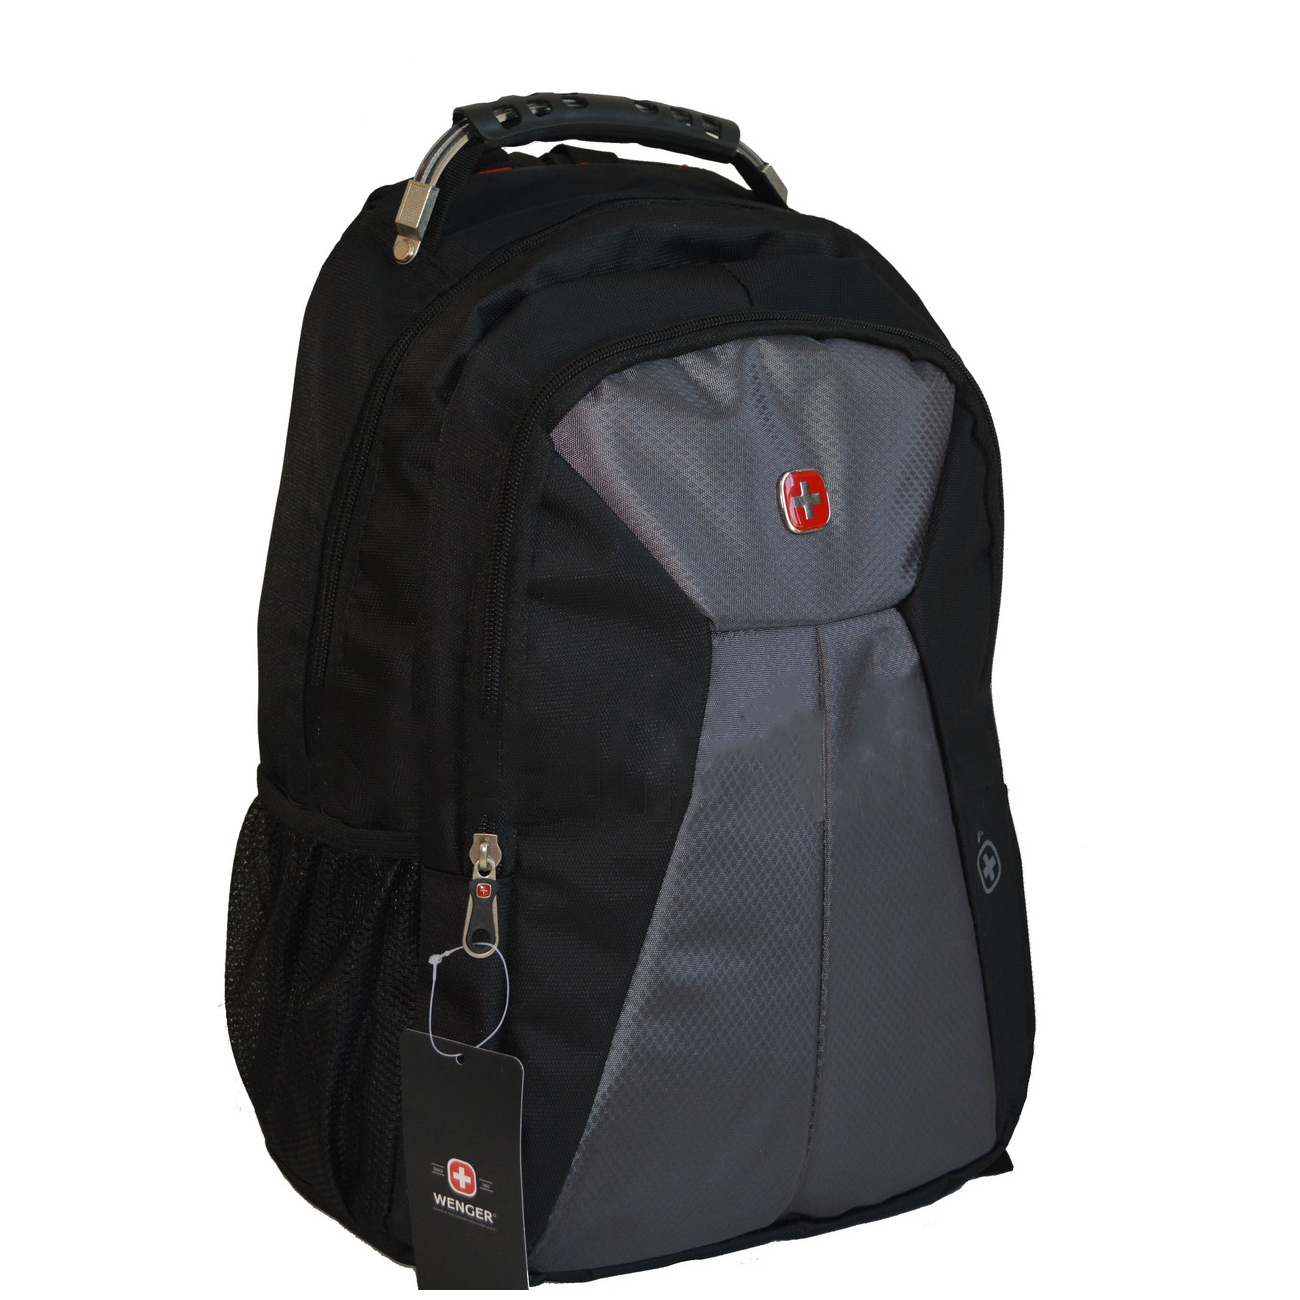 NOTEBOOK BAG SWISSCEAR 8178 BACK COLOR 15.6 صوت+USB ظهر+تطويلة ,Laptop Bag